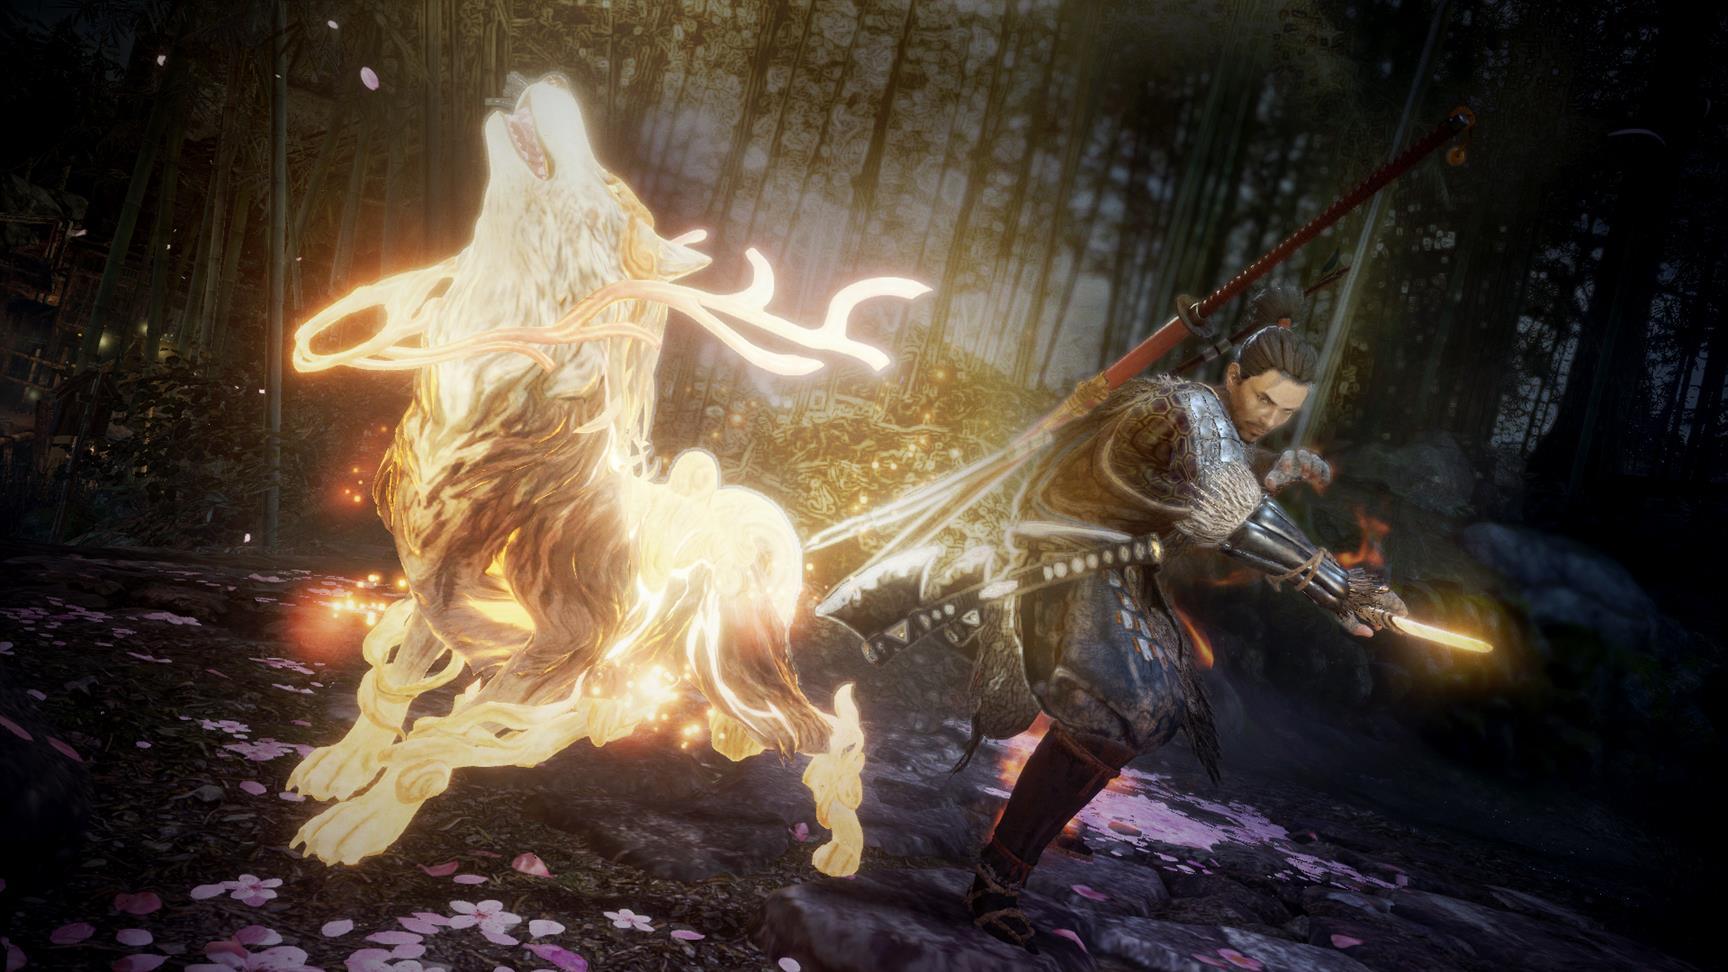 Nioh 2: Demo, pre-order bonuses, character creation, gameplay and more - VG247